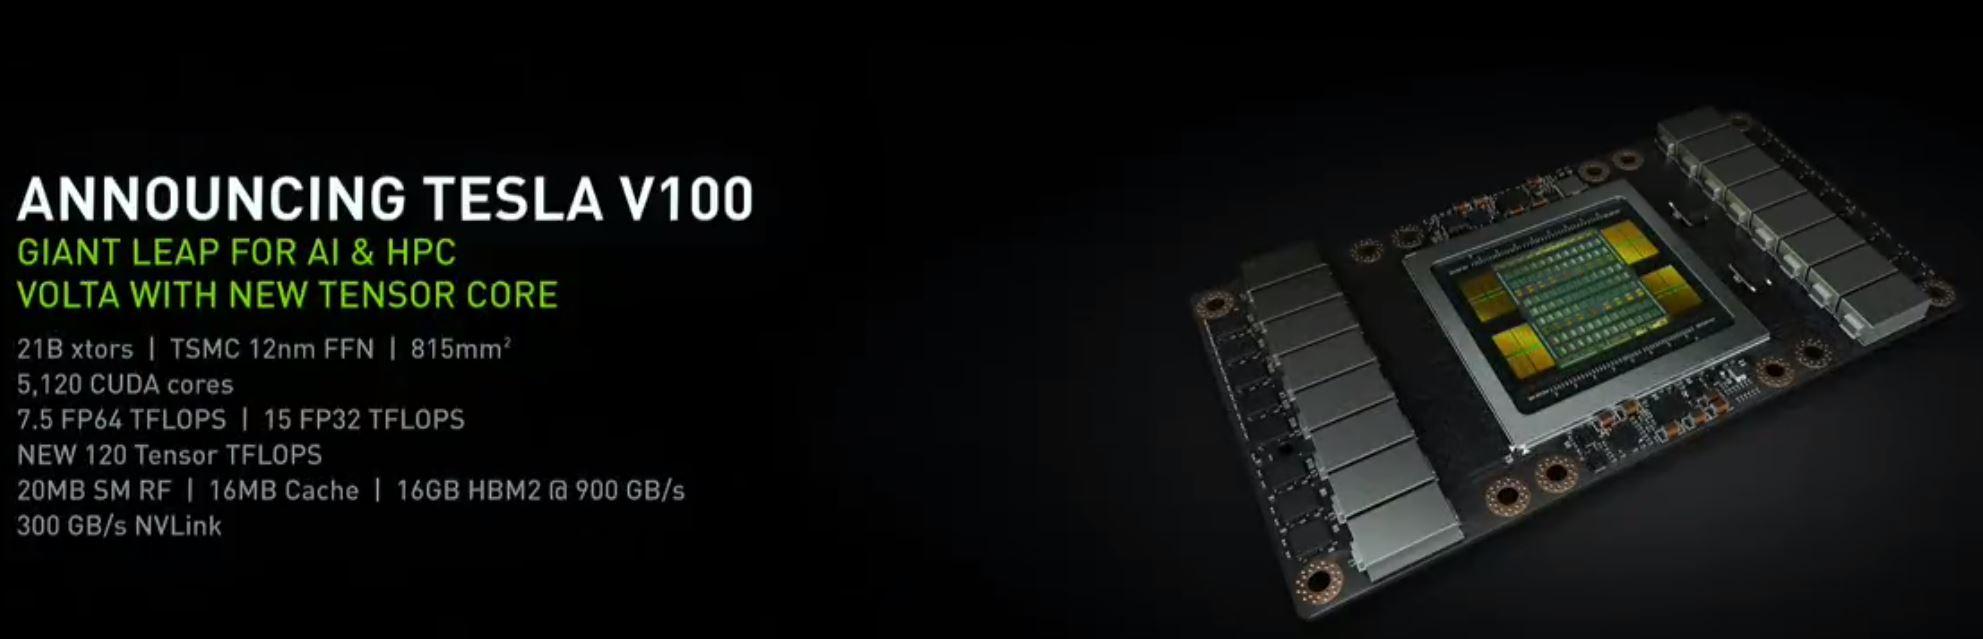 NVIDIA GTC 2017 Tesla Volta V100 12nm TSMC